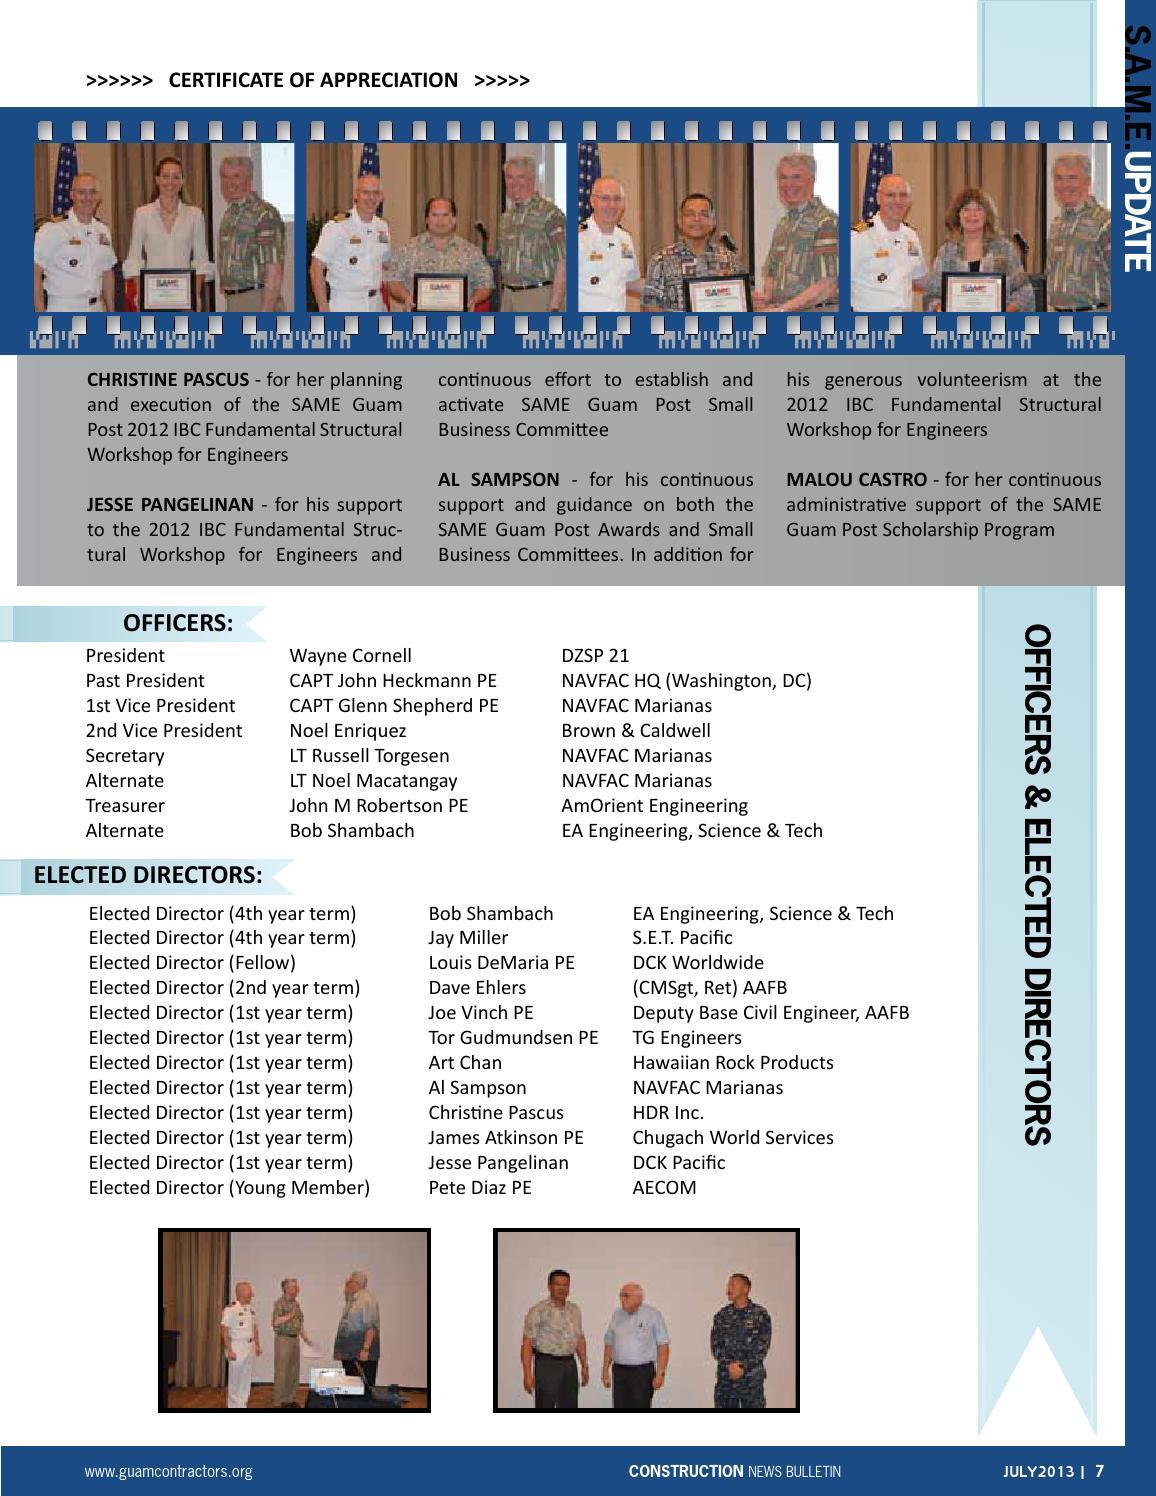 Gca Construction News Bulletin July 2013 By Geri Leon Guerrero Issuu